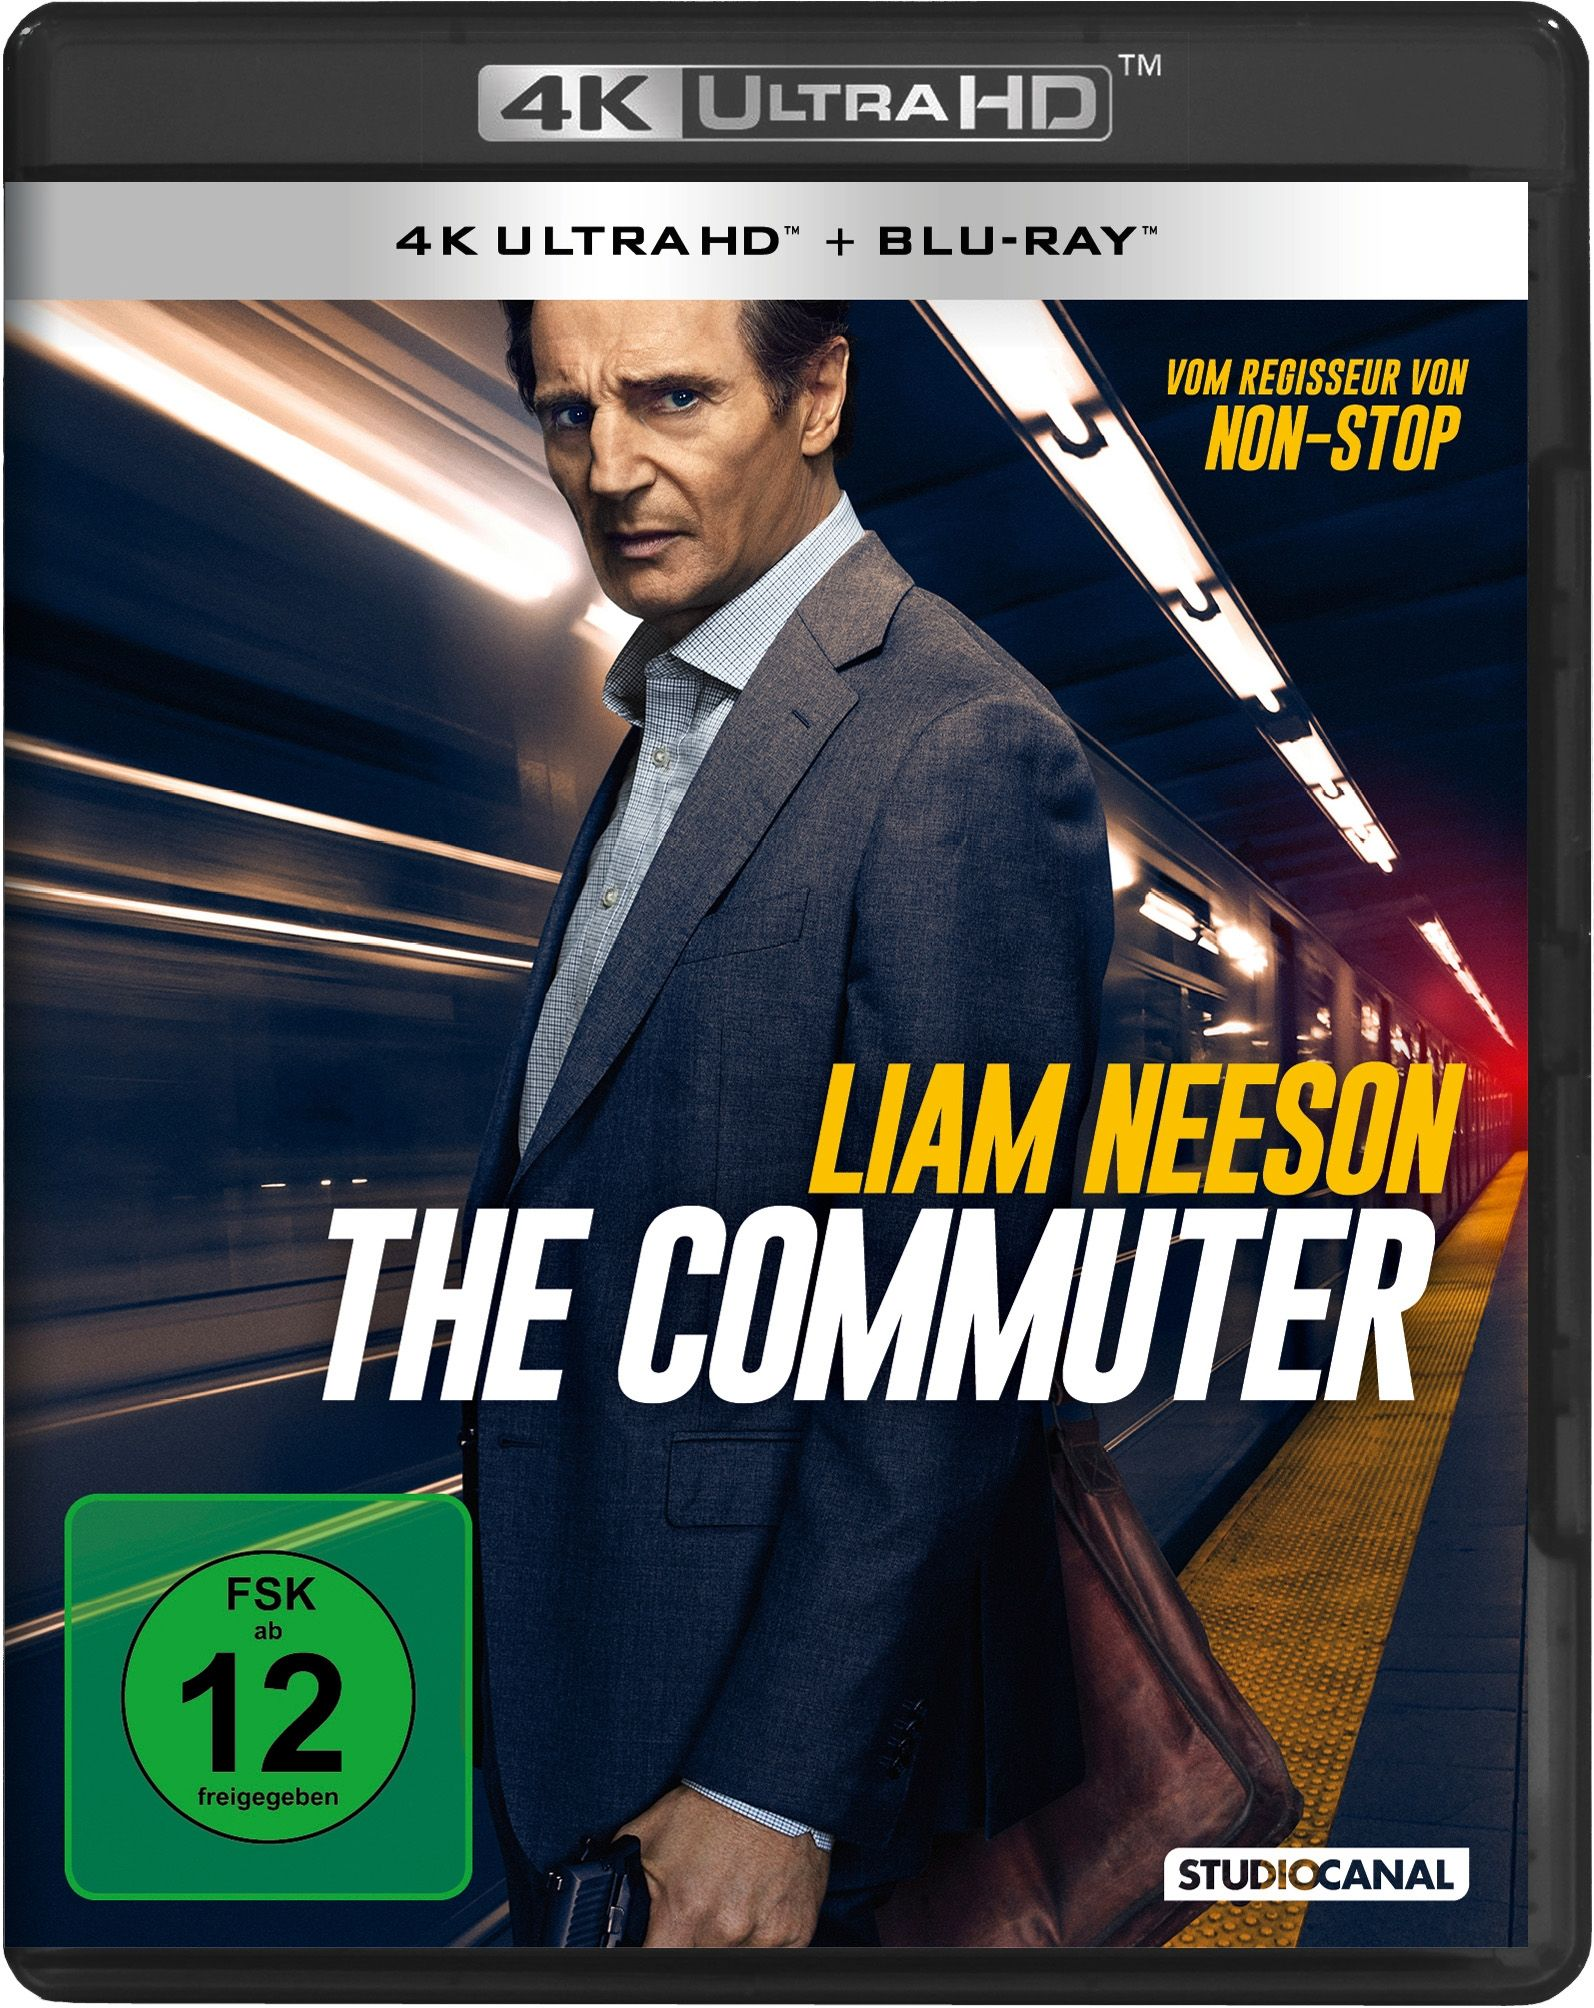 Commuter, The (2 Discs) (UHD BLURAY + BLURAY)